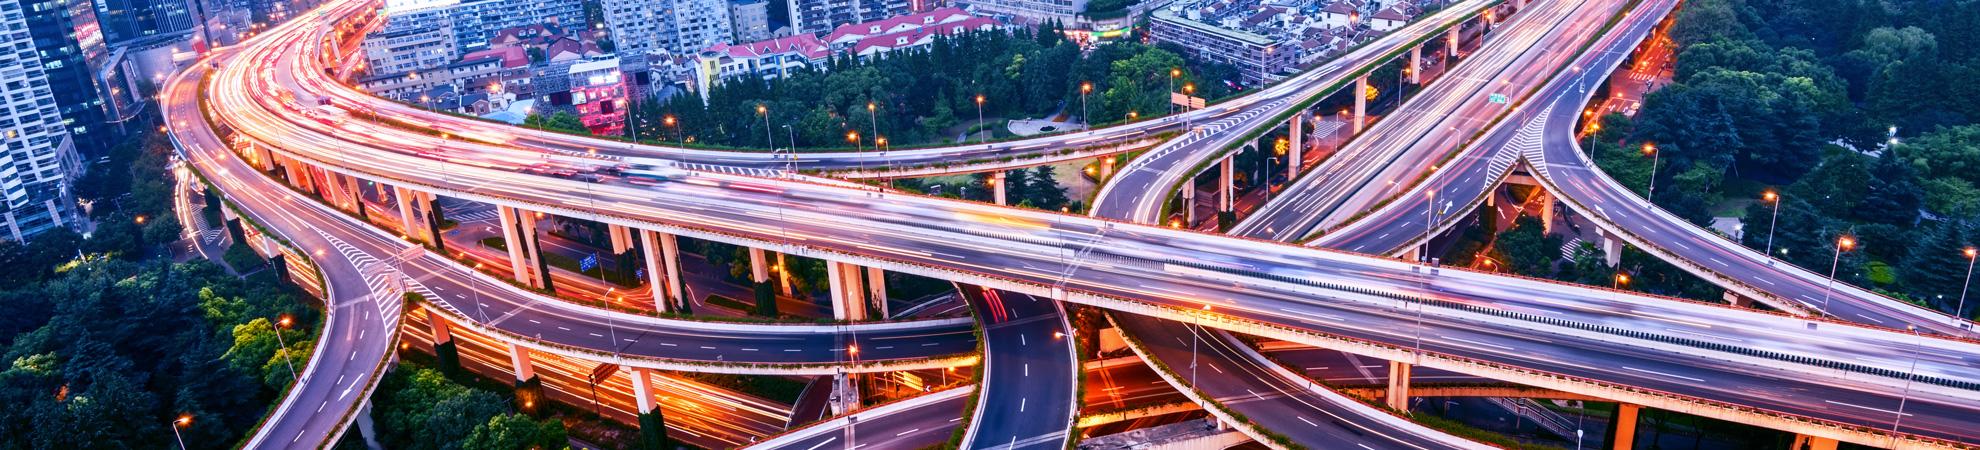 Transports en commun en Chine